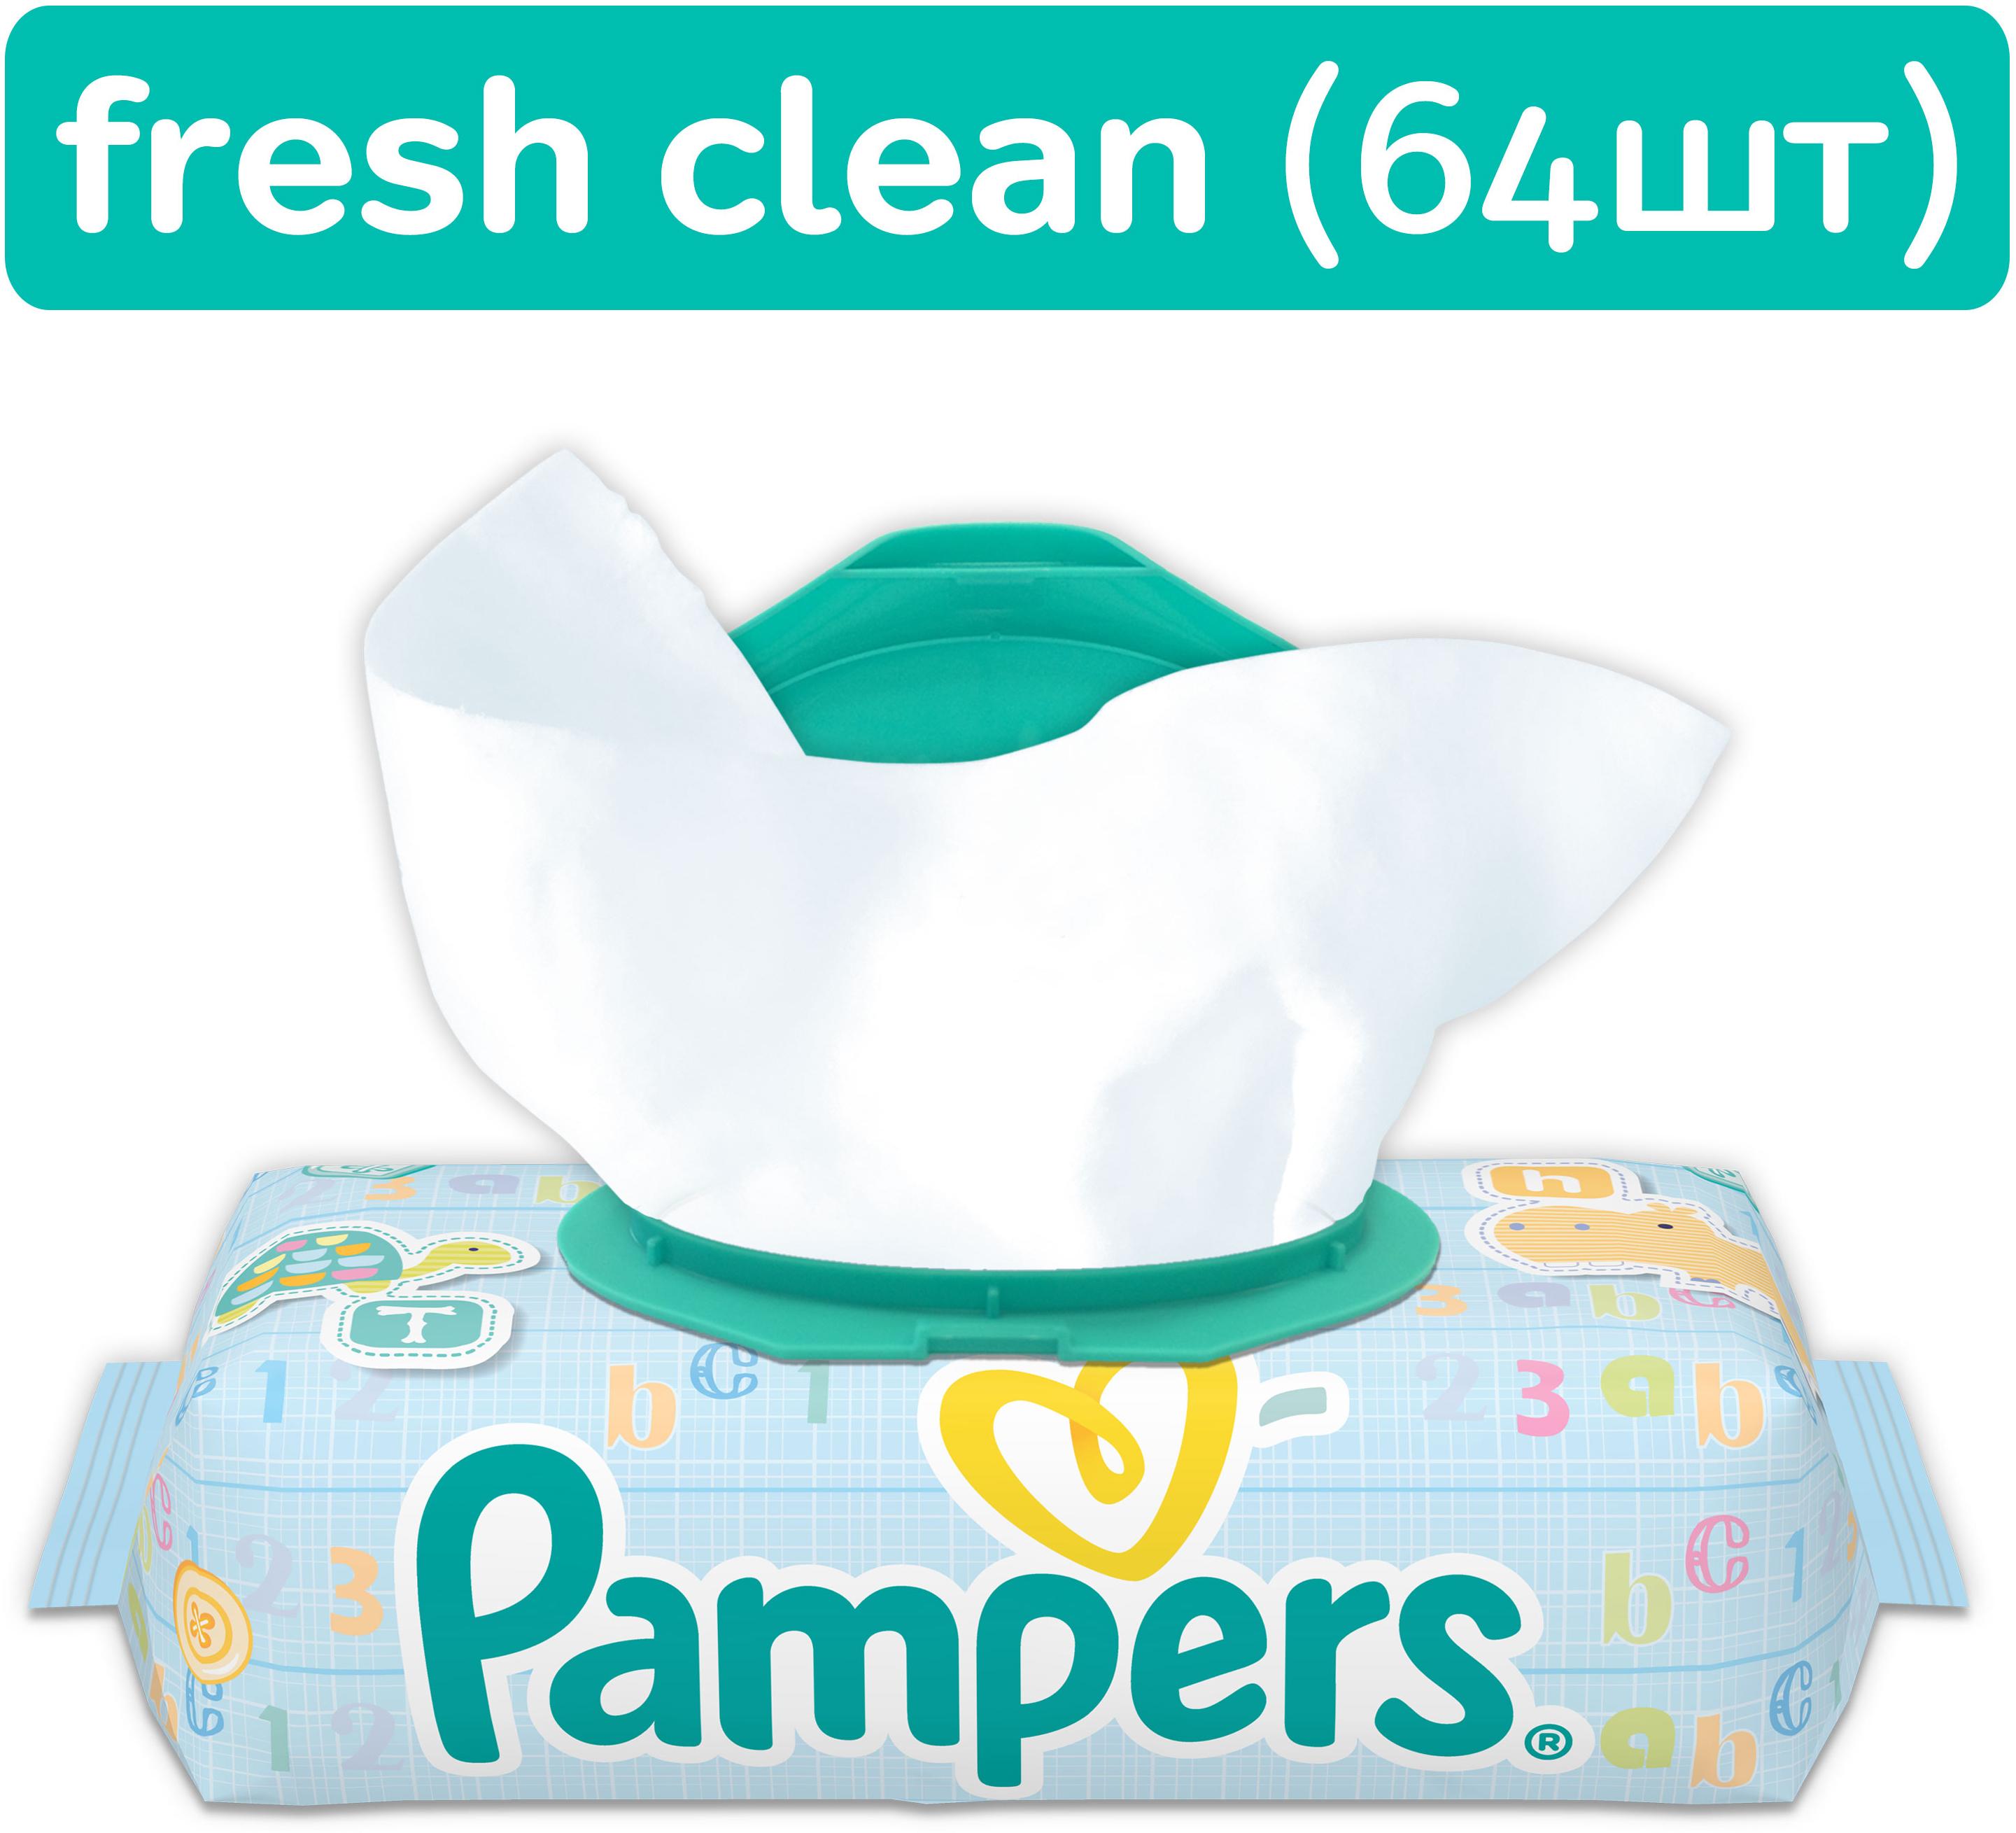 Детские влажные салфетки Procter & Gamble Baby Fresh Clean (64 шт.) цена